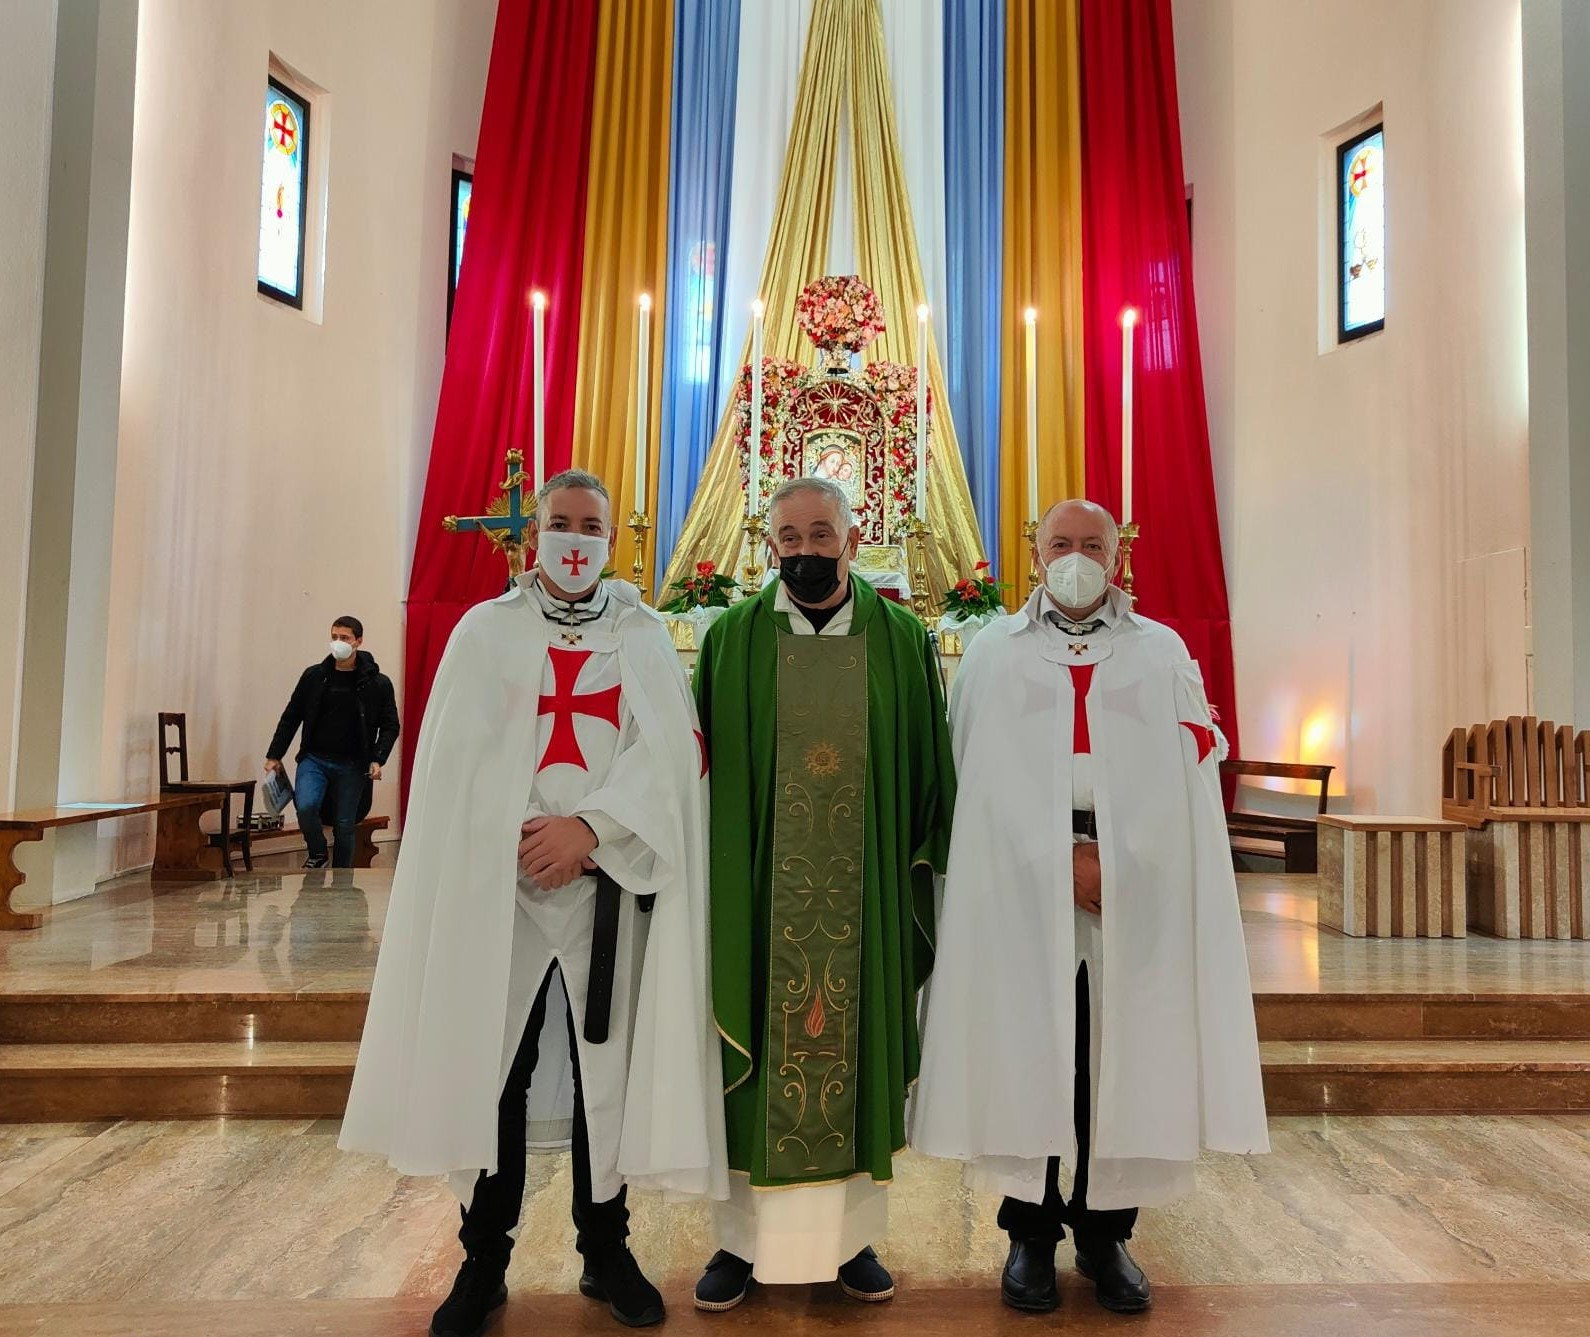 Santa Messa – Chiesa San Bartolomeo – Borgo Tossignano (BO) 10.10.2021